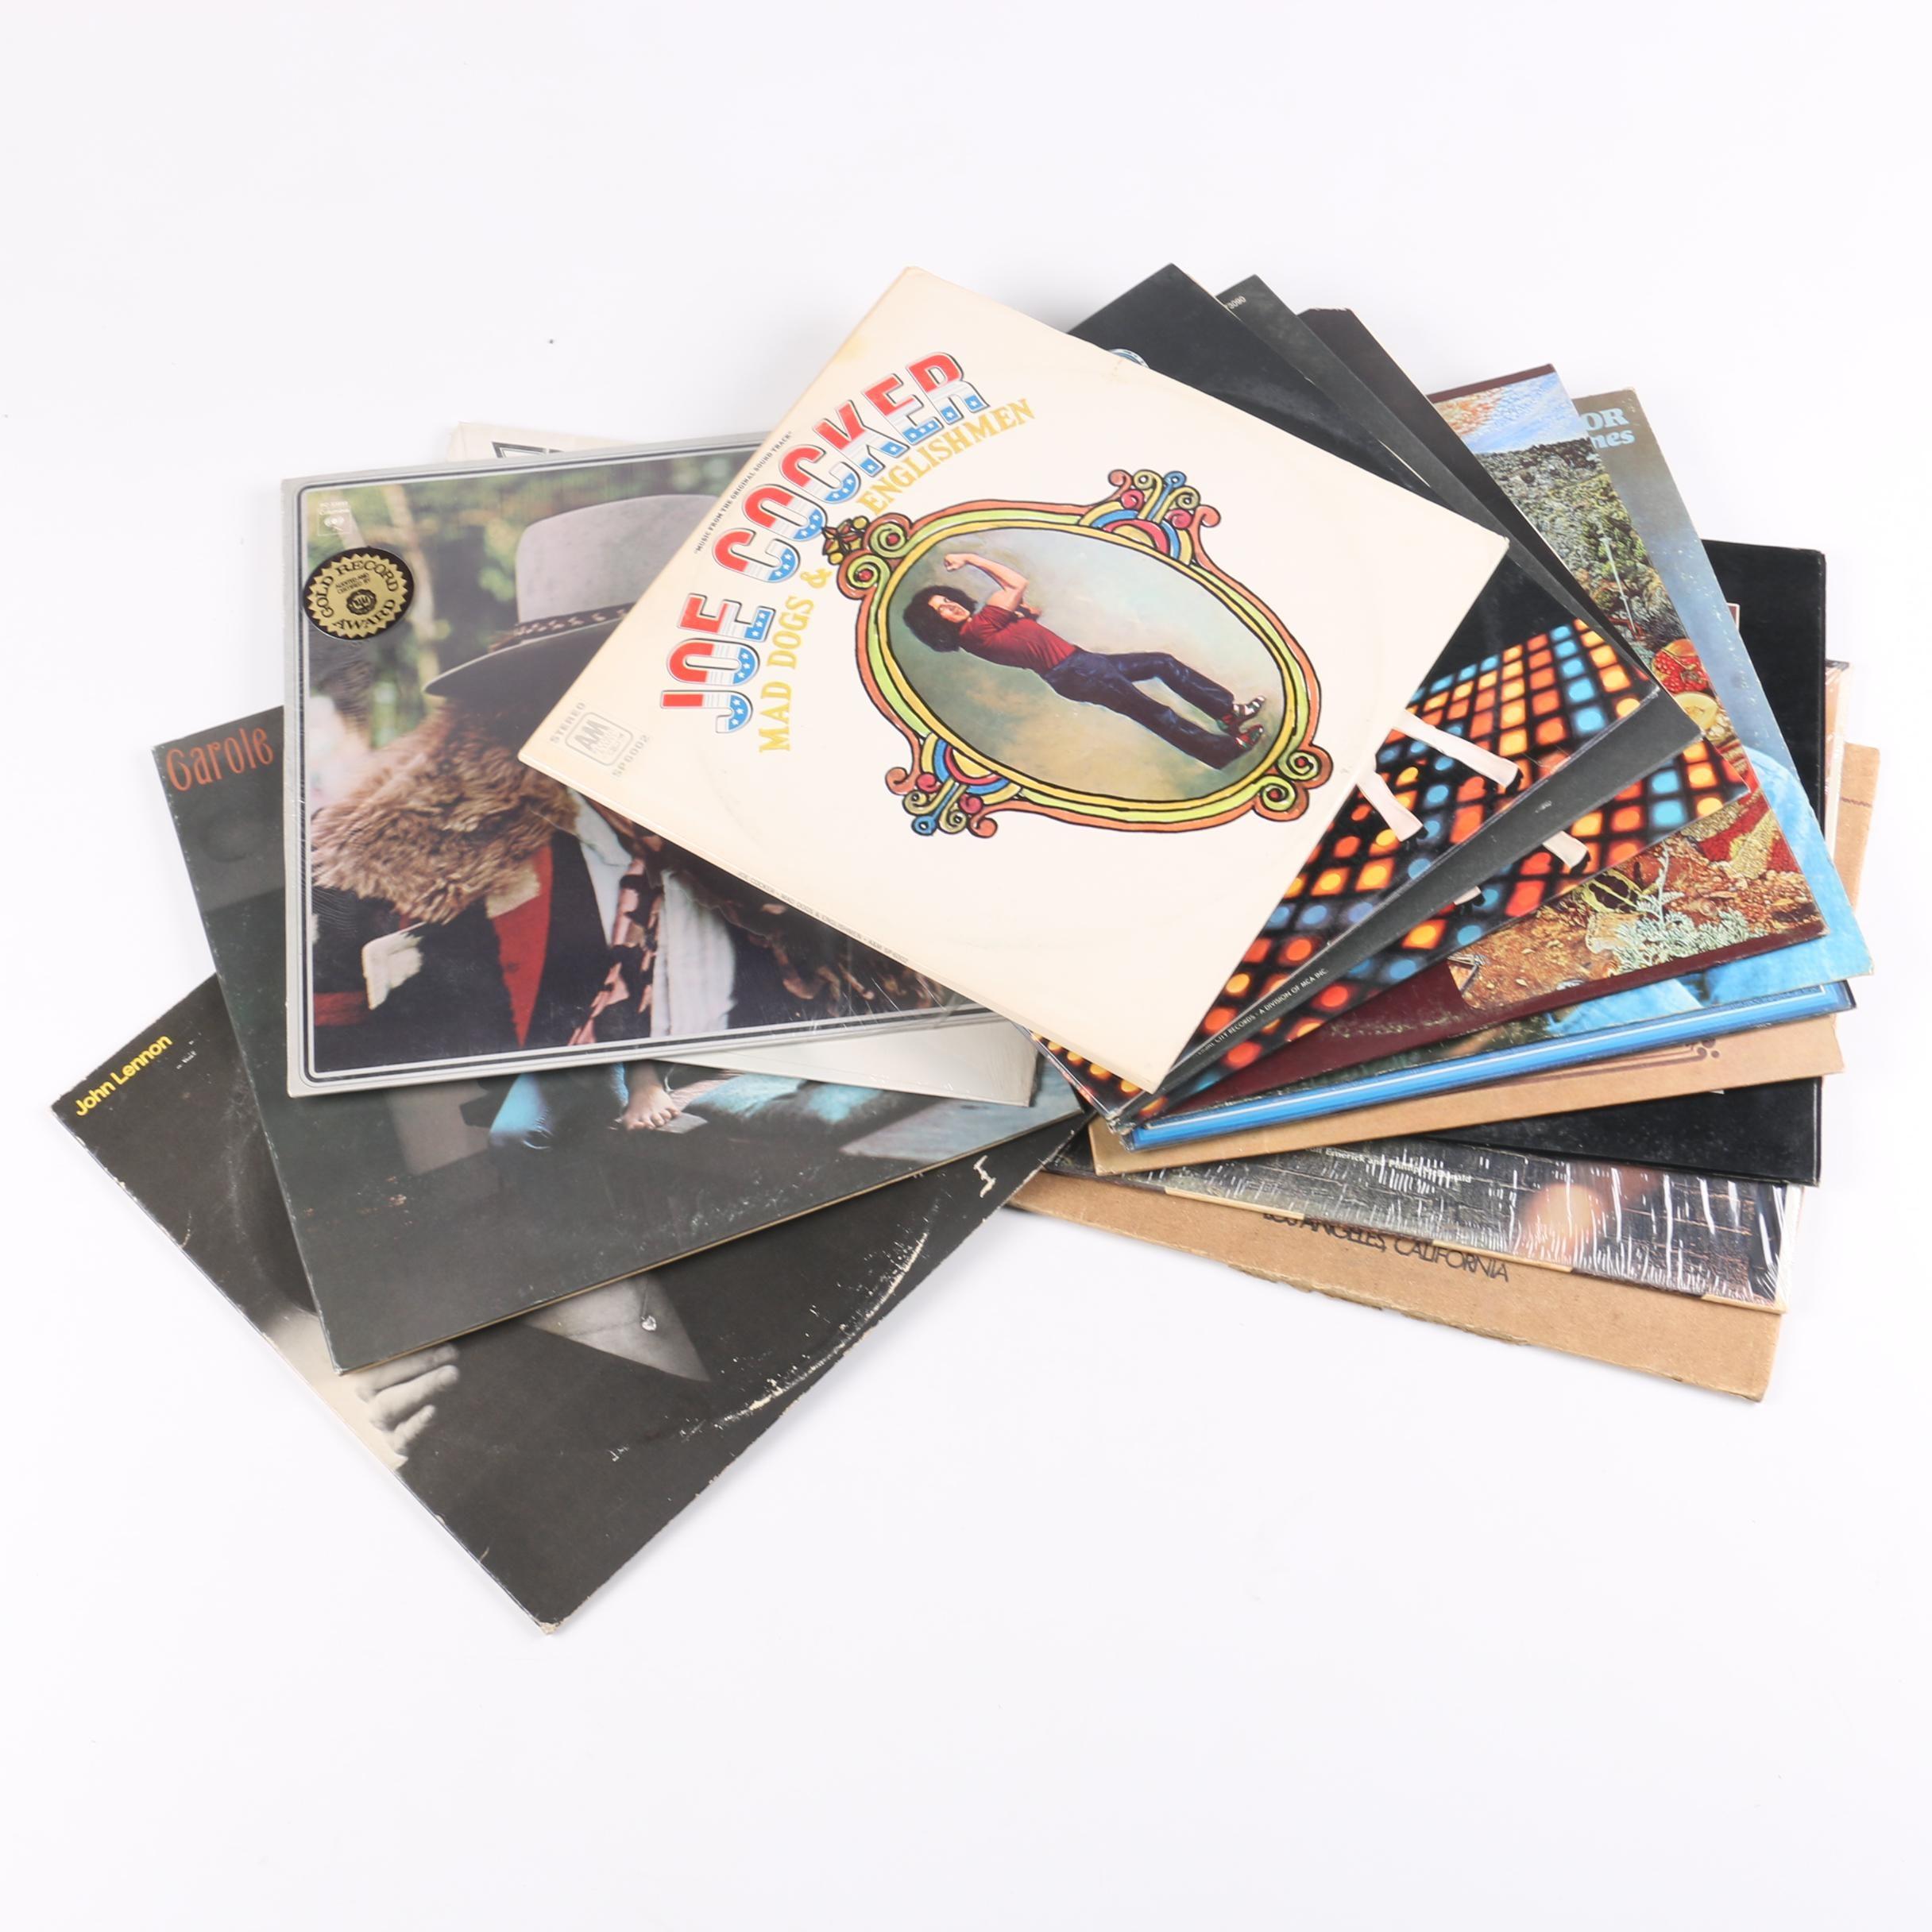 The Beatles, Joe Cocker, Fleetwood Mac, and Other Classic LPs